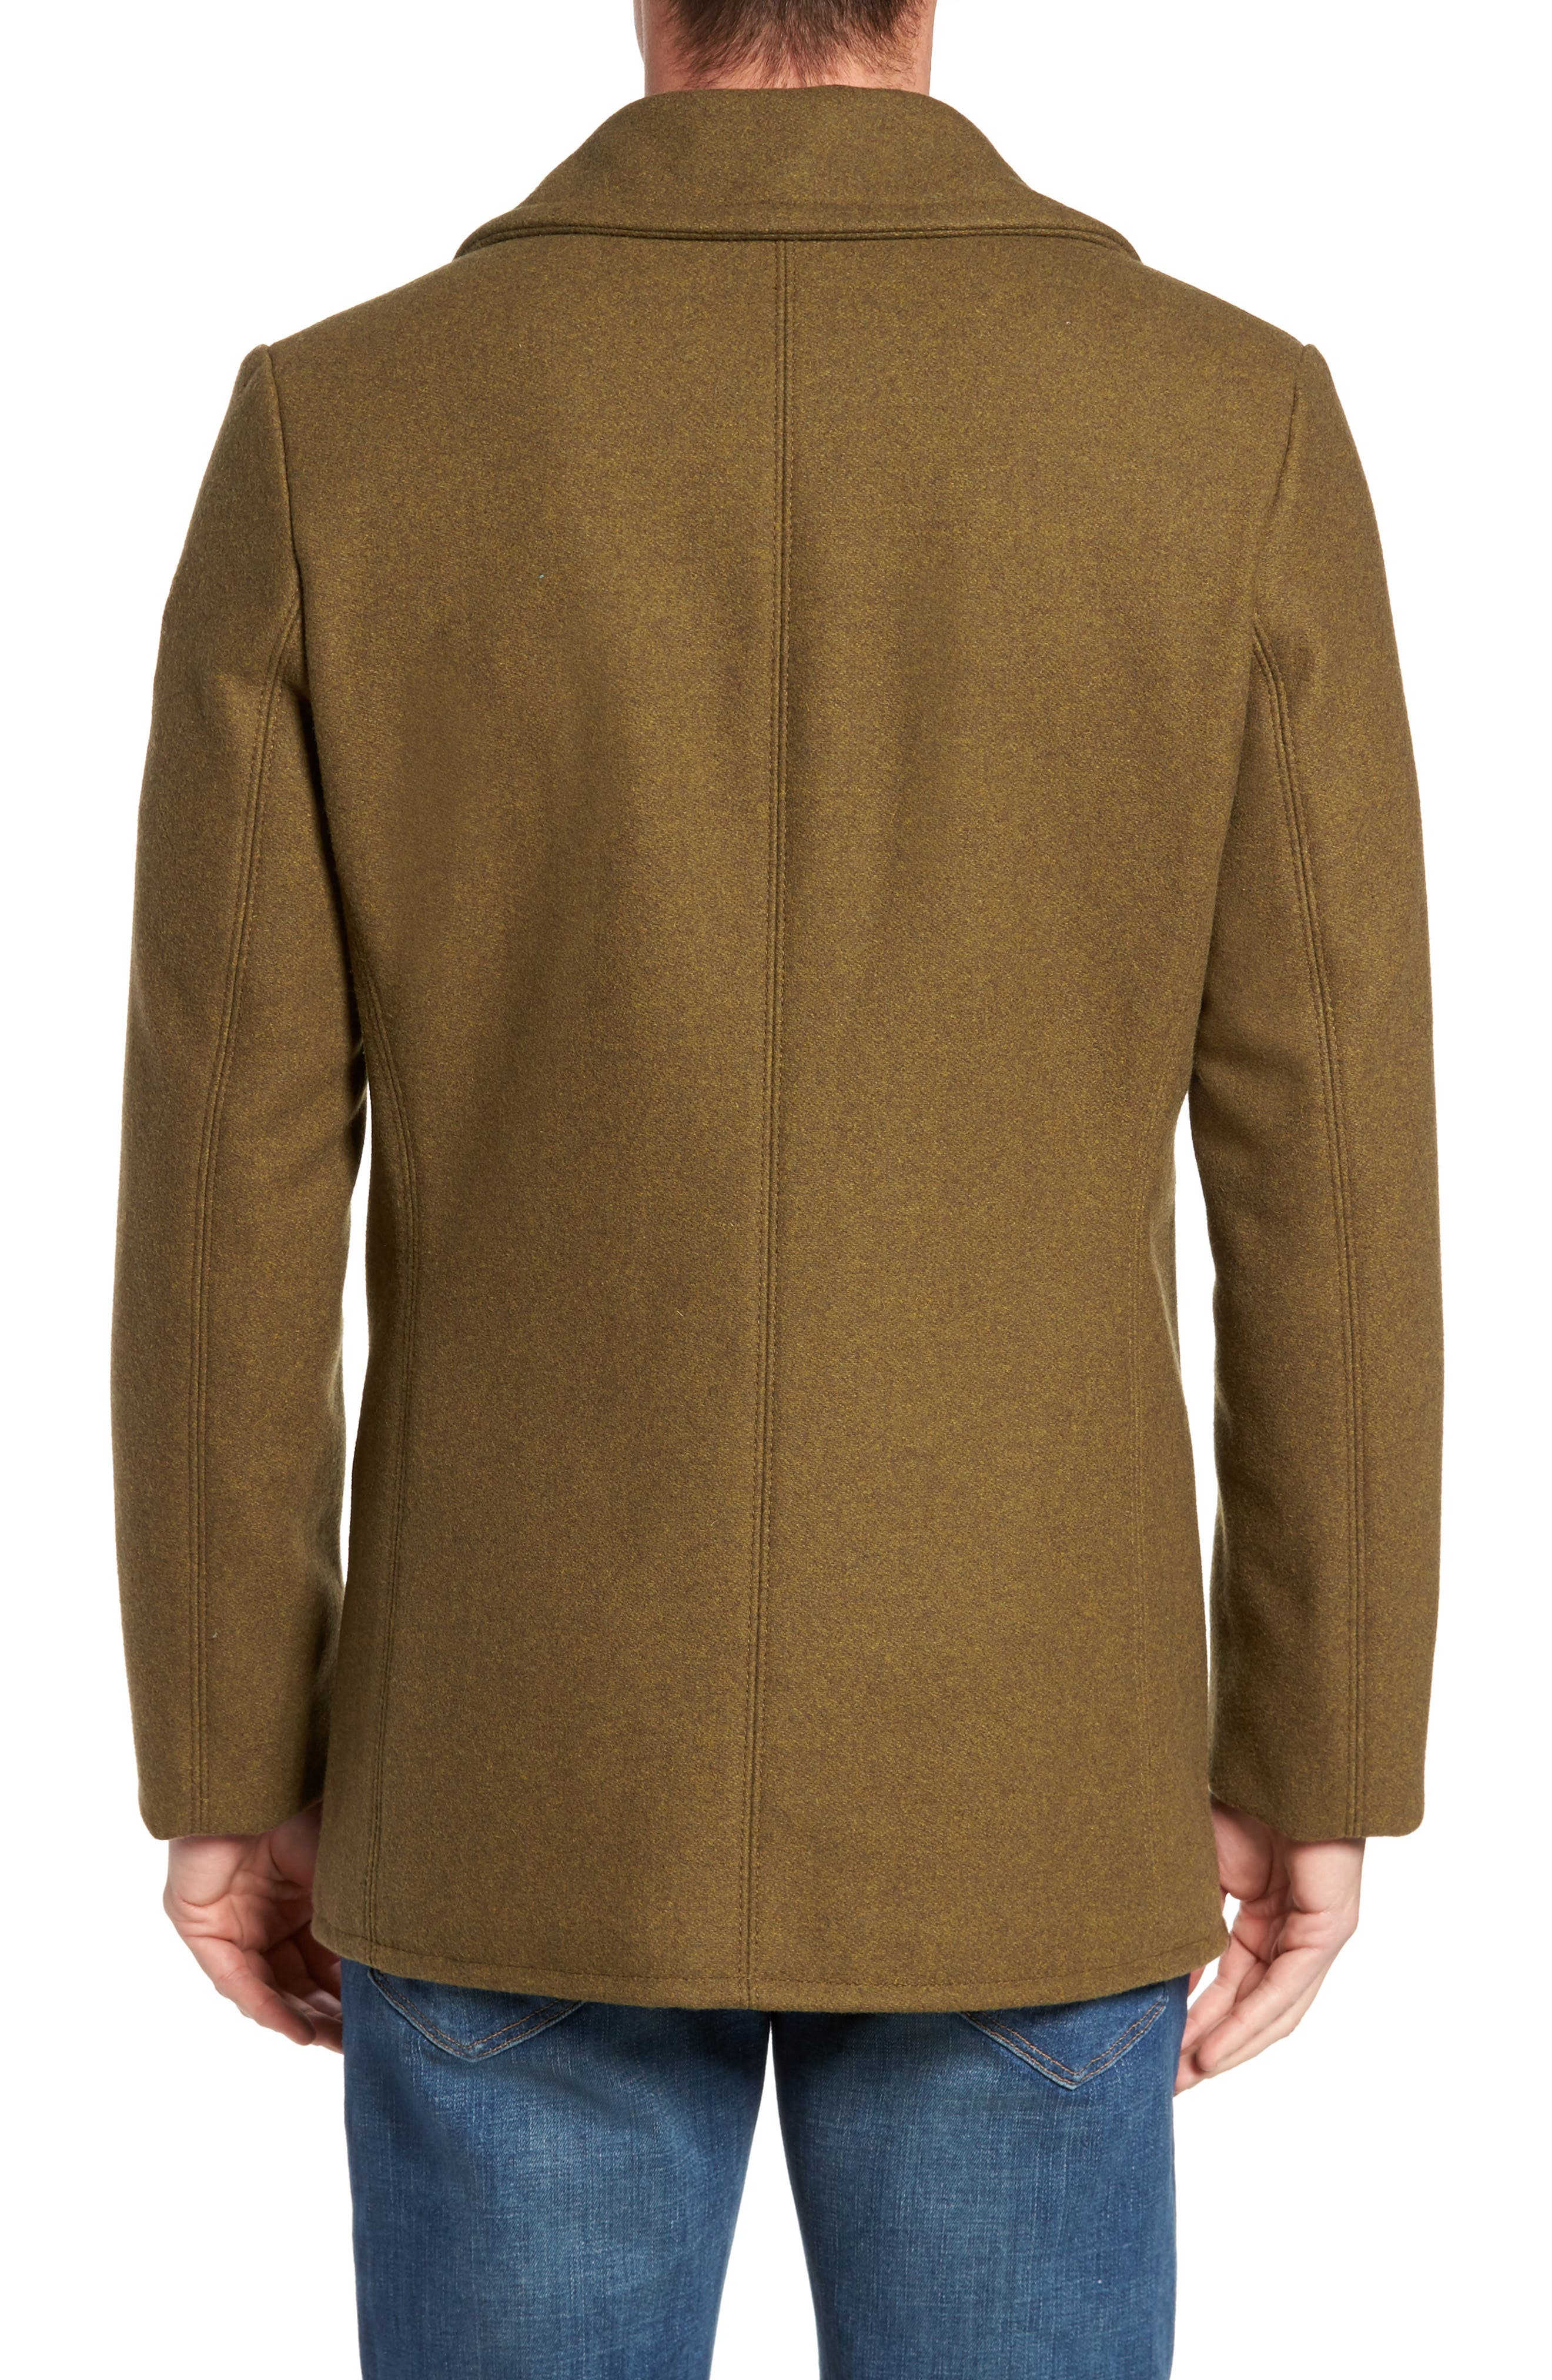 Embellished Slim Wool Blend Peacoat,                             Alternate thumbnail 2, color,                             252